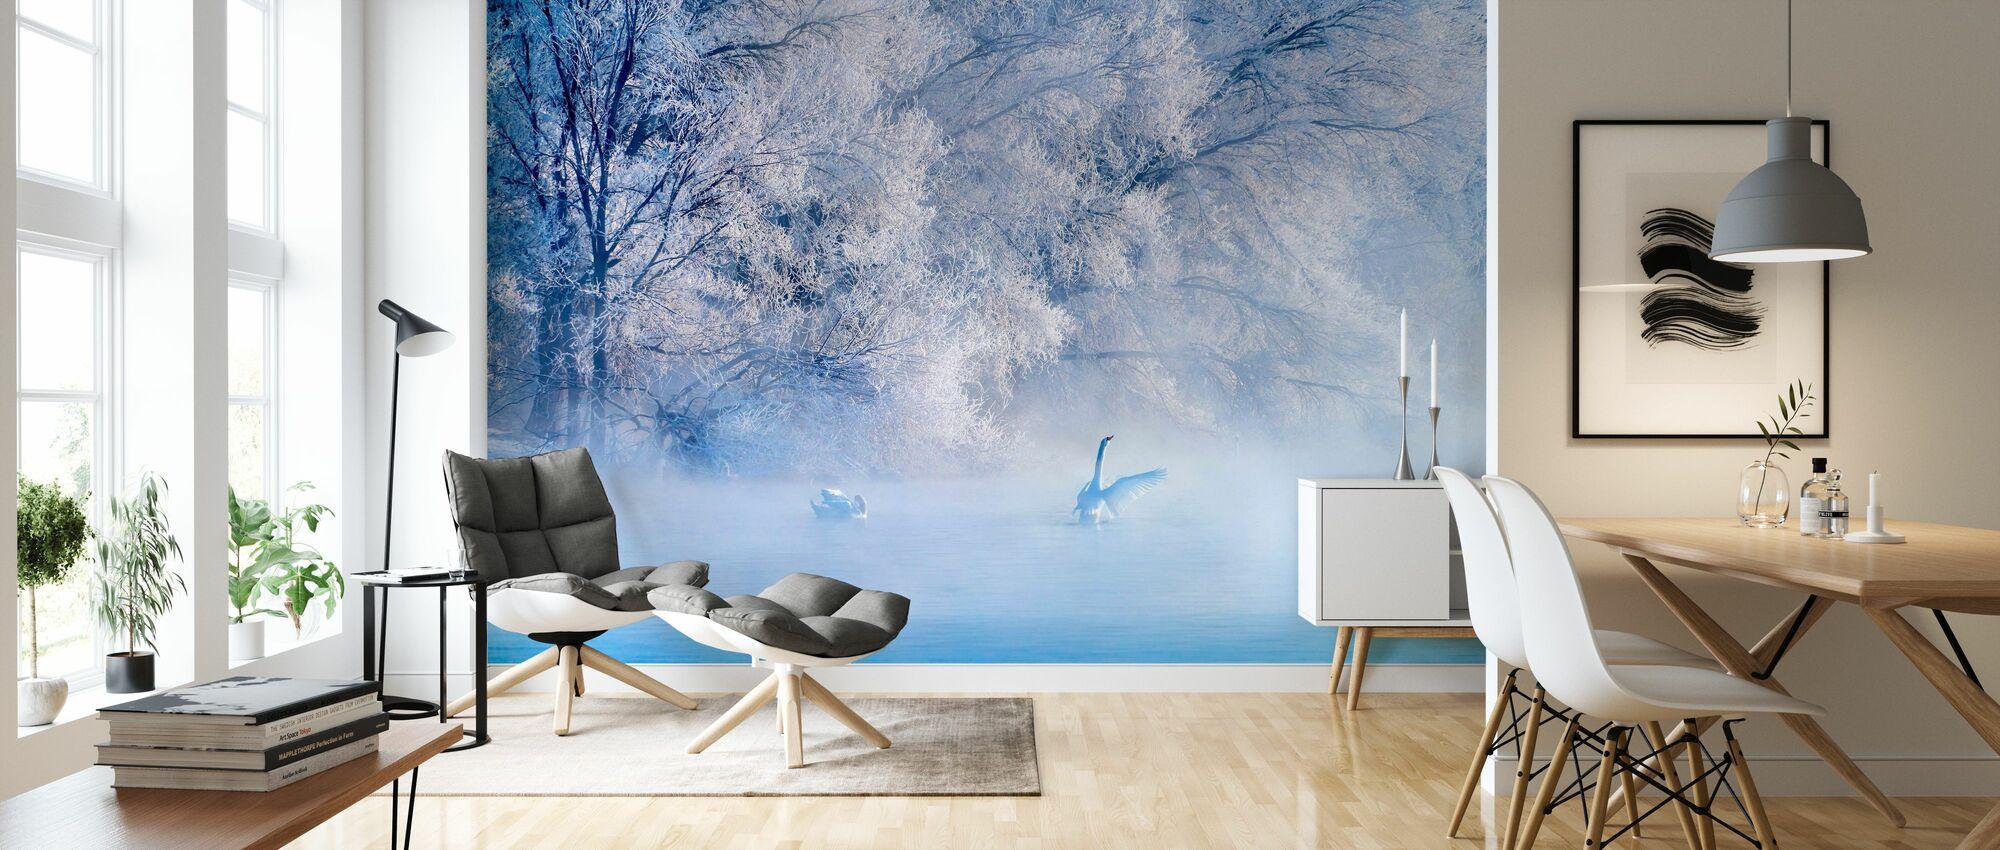 Swan Lake - Wallpaper - Living Room